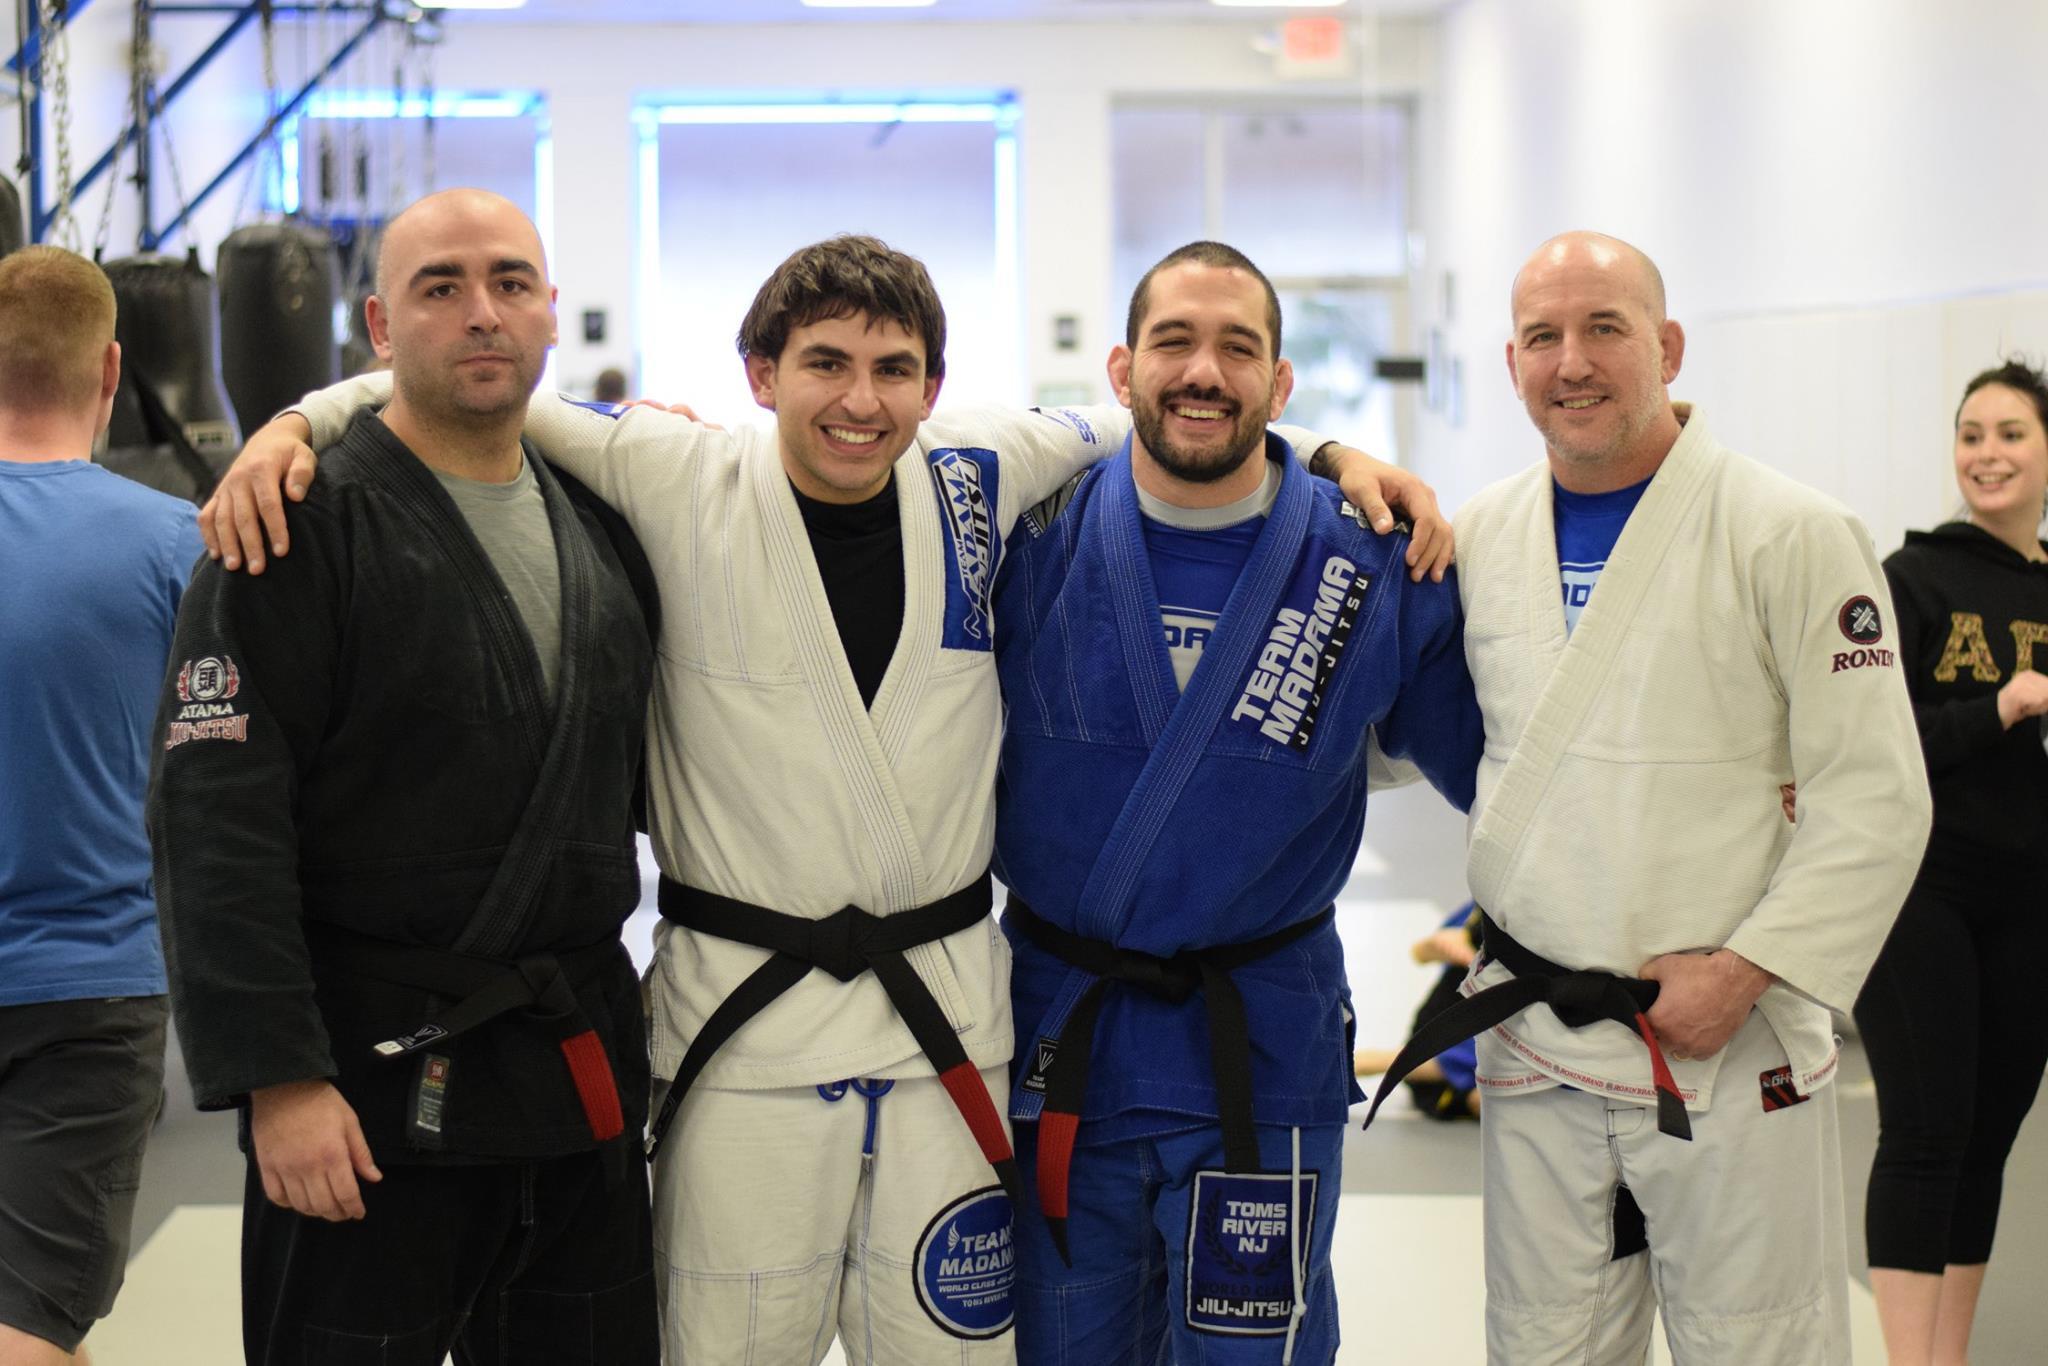 Professors Mike Kuchta, Joe-John Kuchta, Mike Elshamy, and Jim McCormick